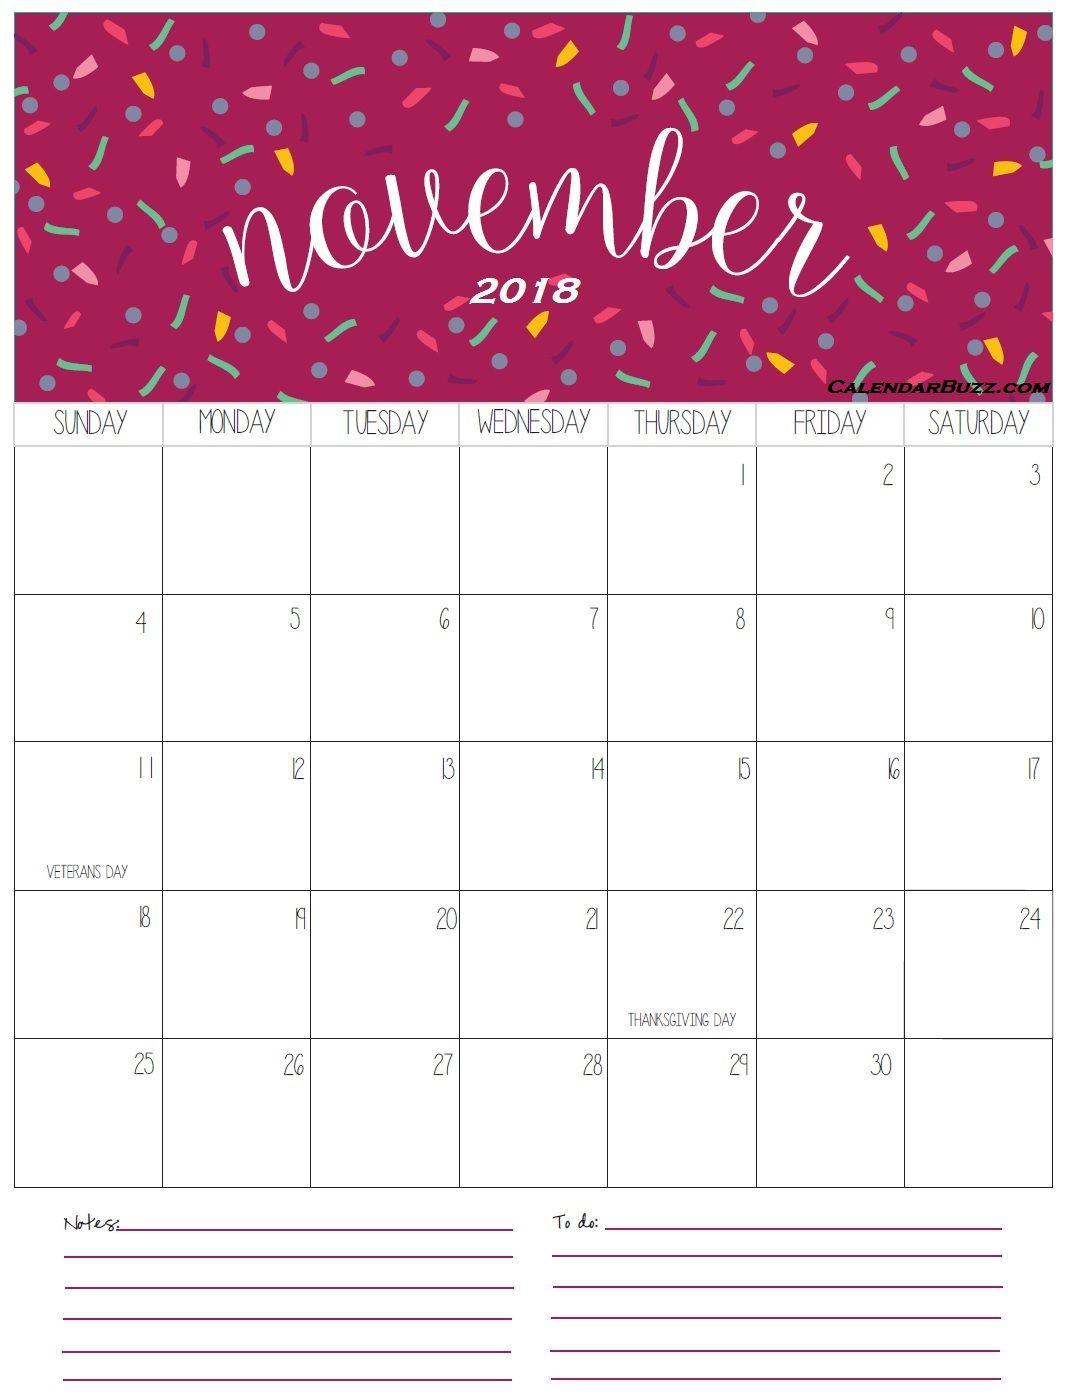 November 2018 Calendar Portrait With Notes